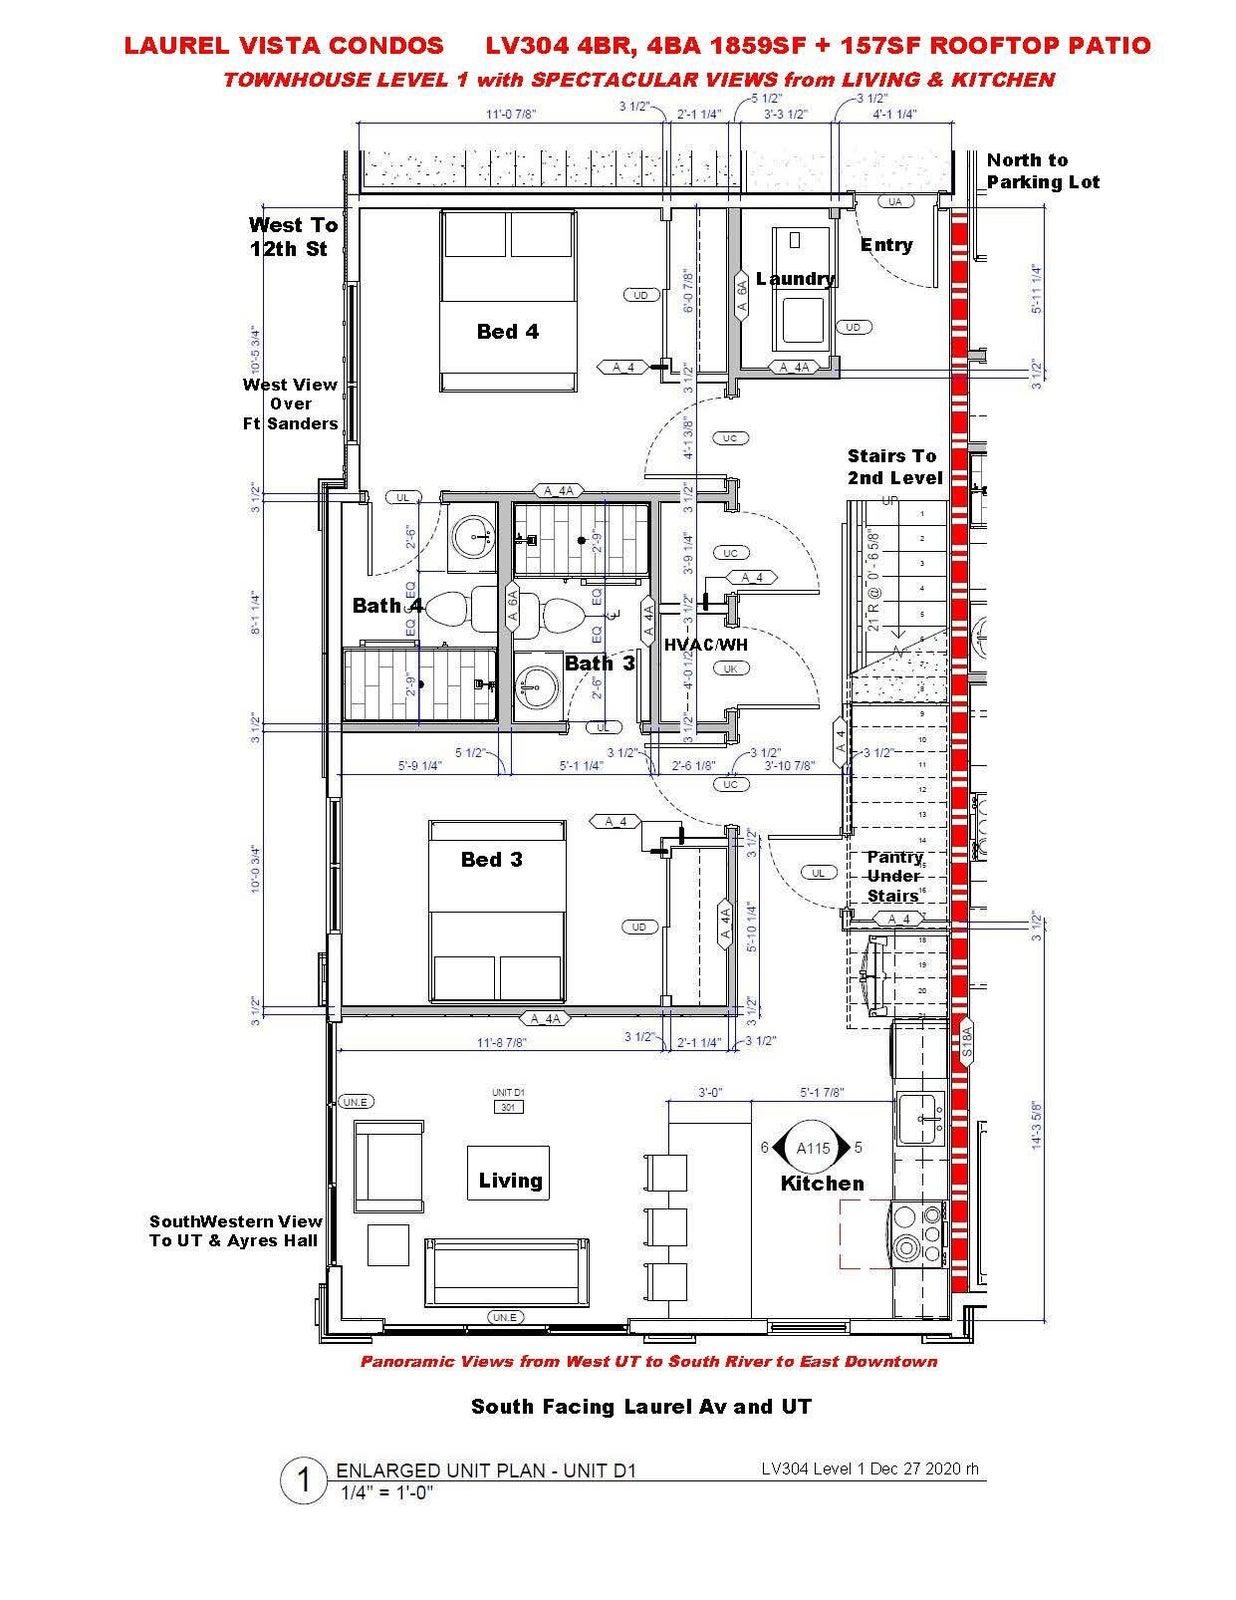 LV304 4BR,4BA Townhouse Level 1 - Floorp